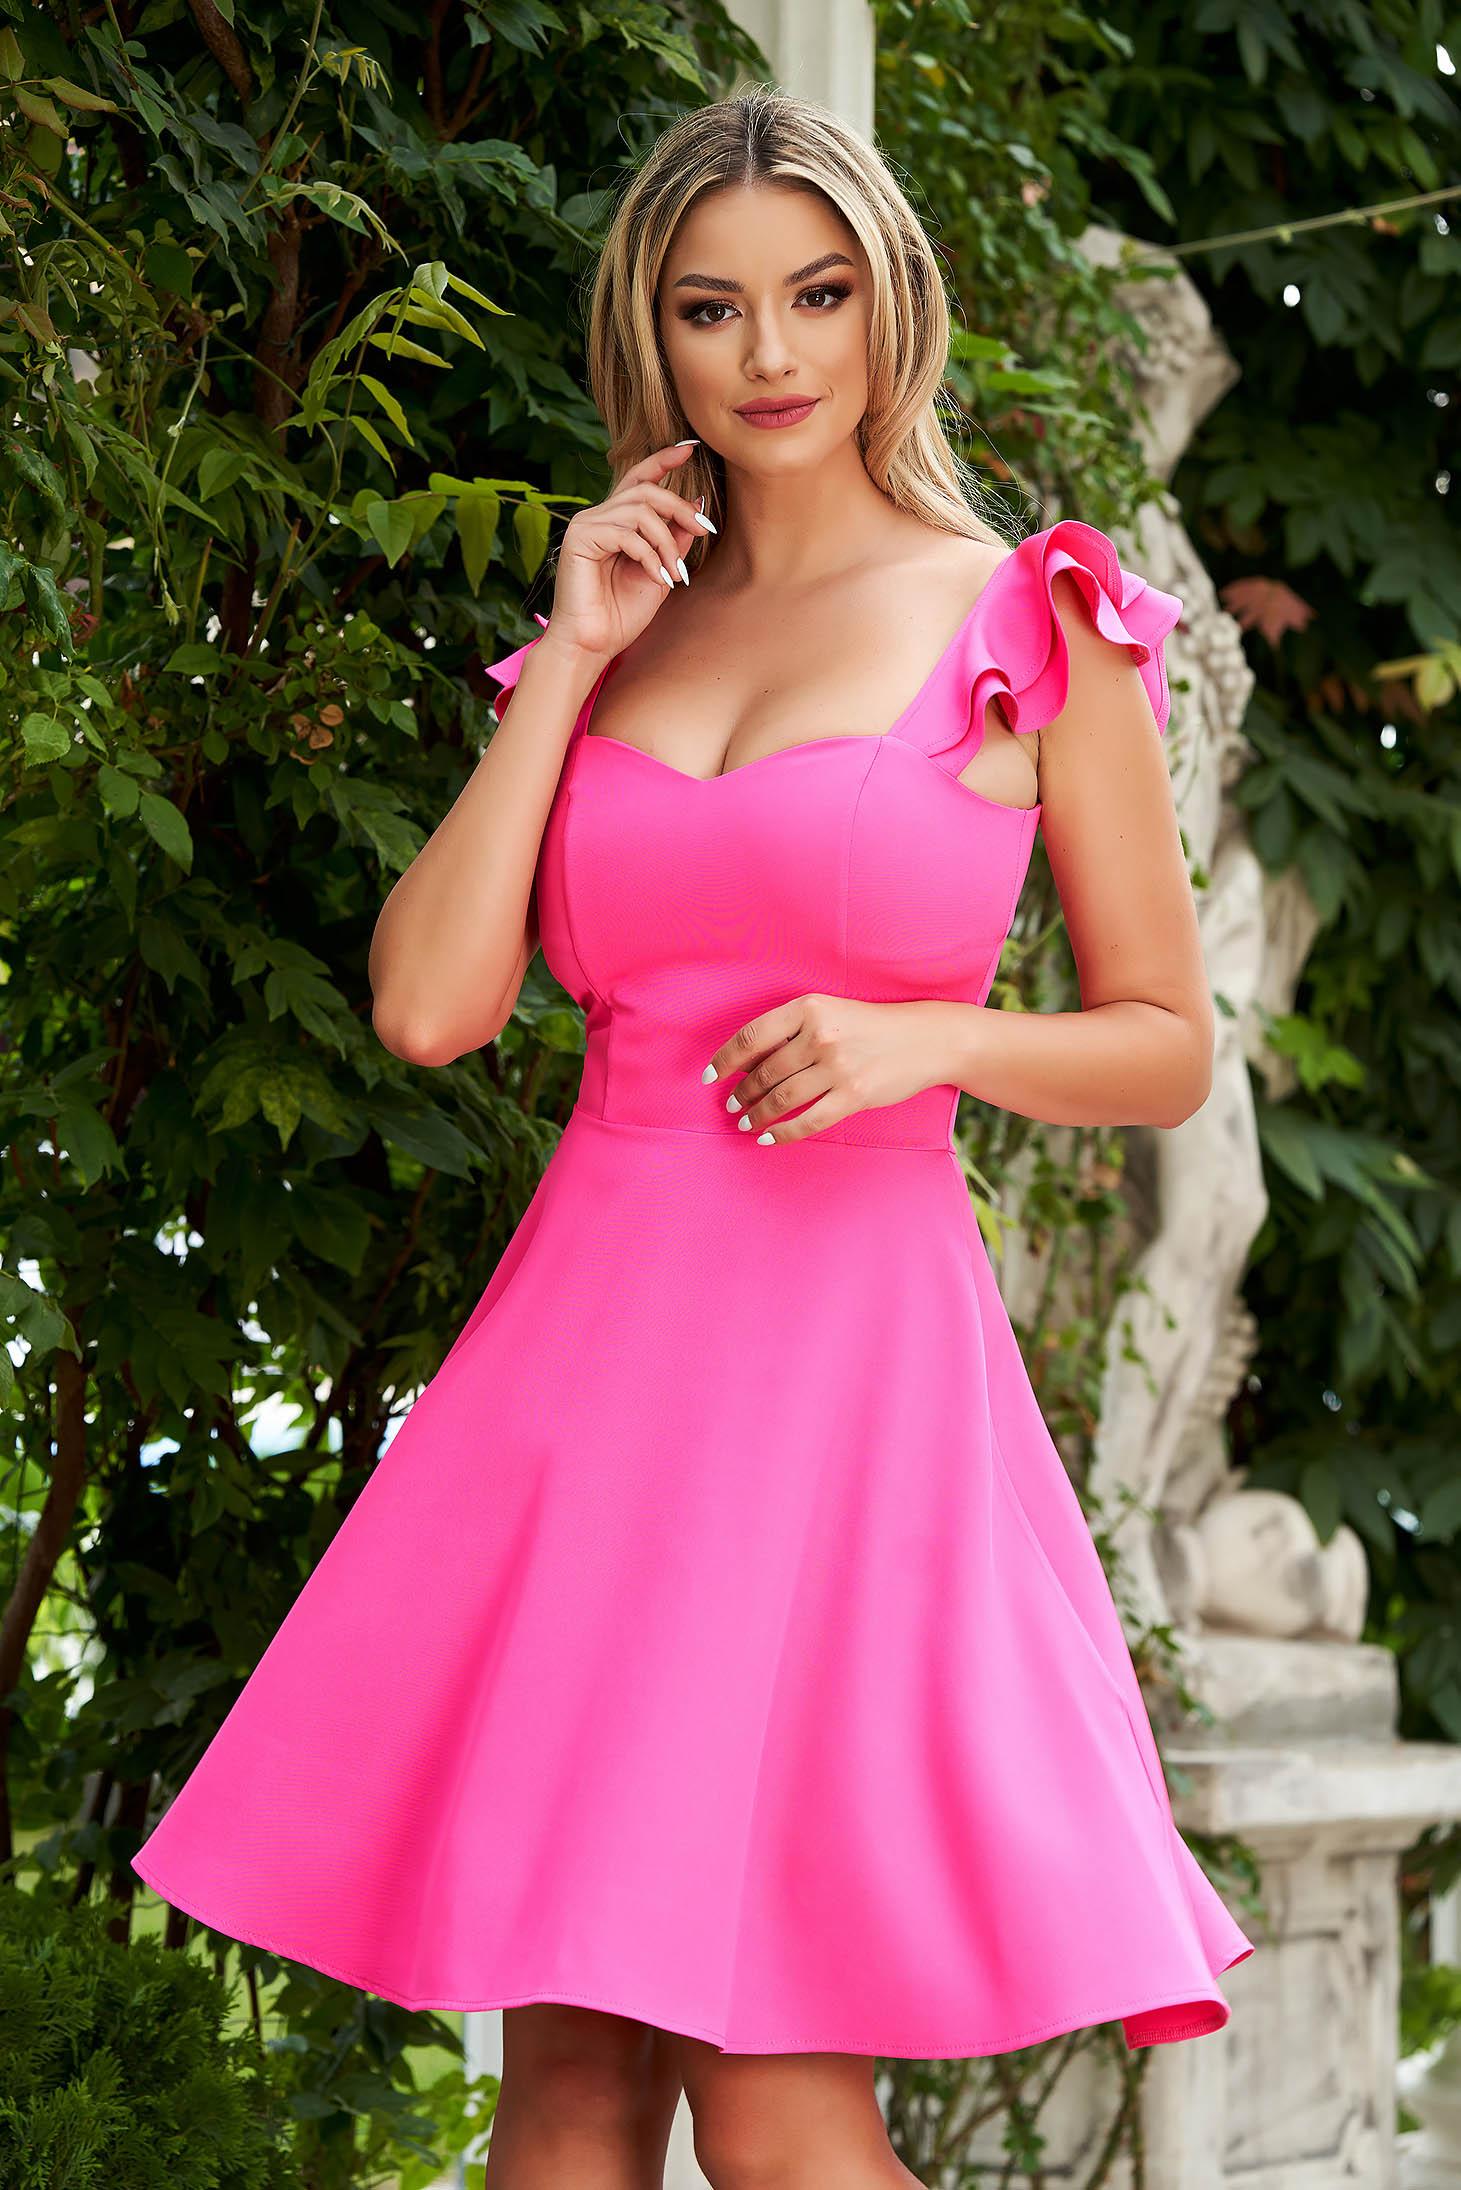 Rochie StarShinerS roz eleganta scurta din stofa subtire cu volanase